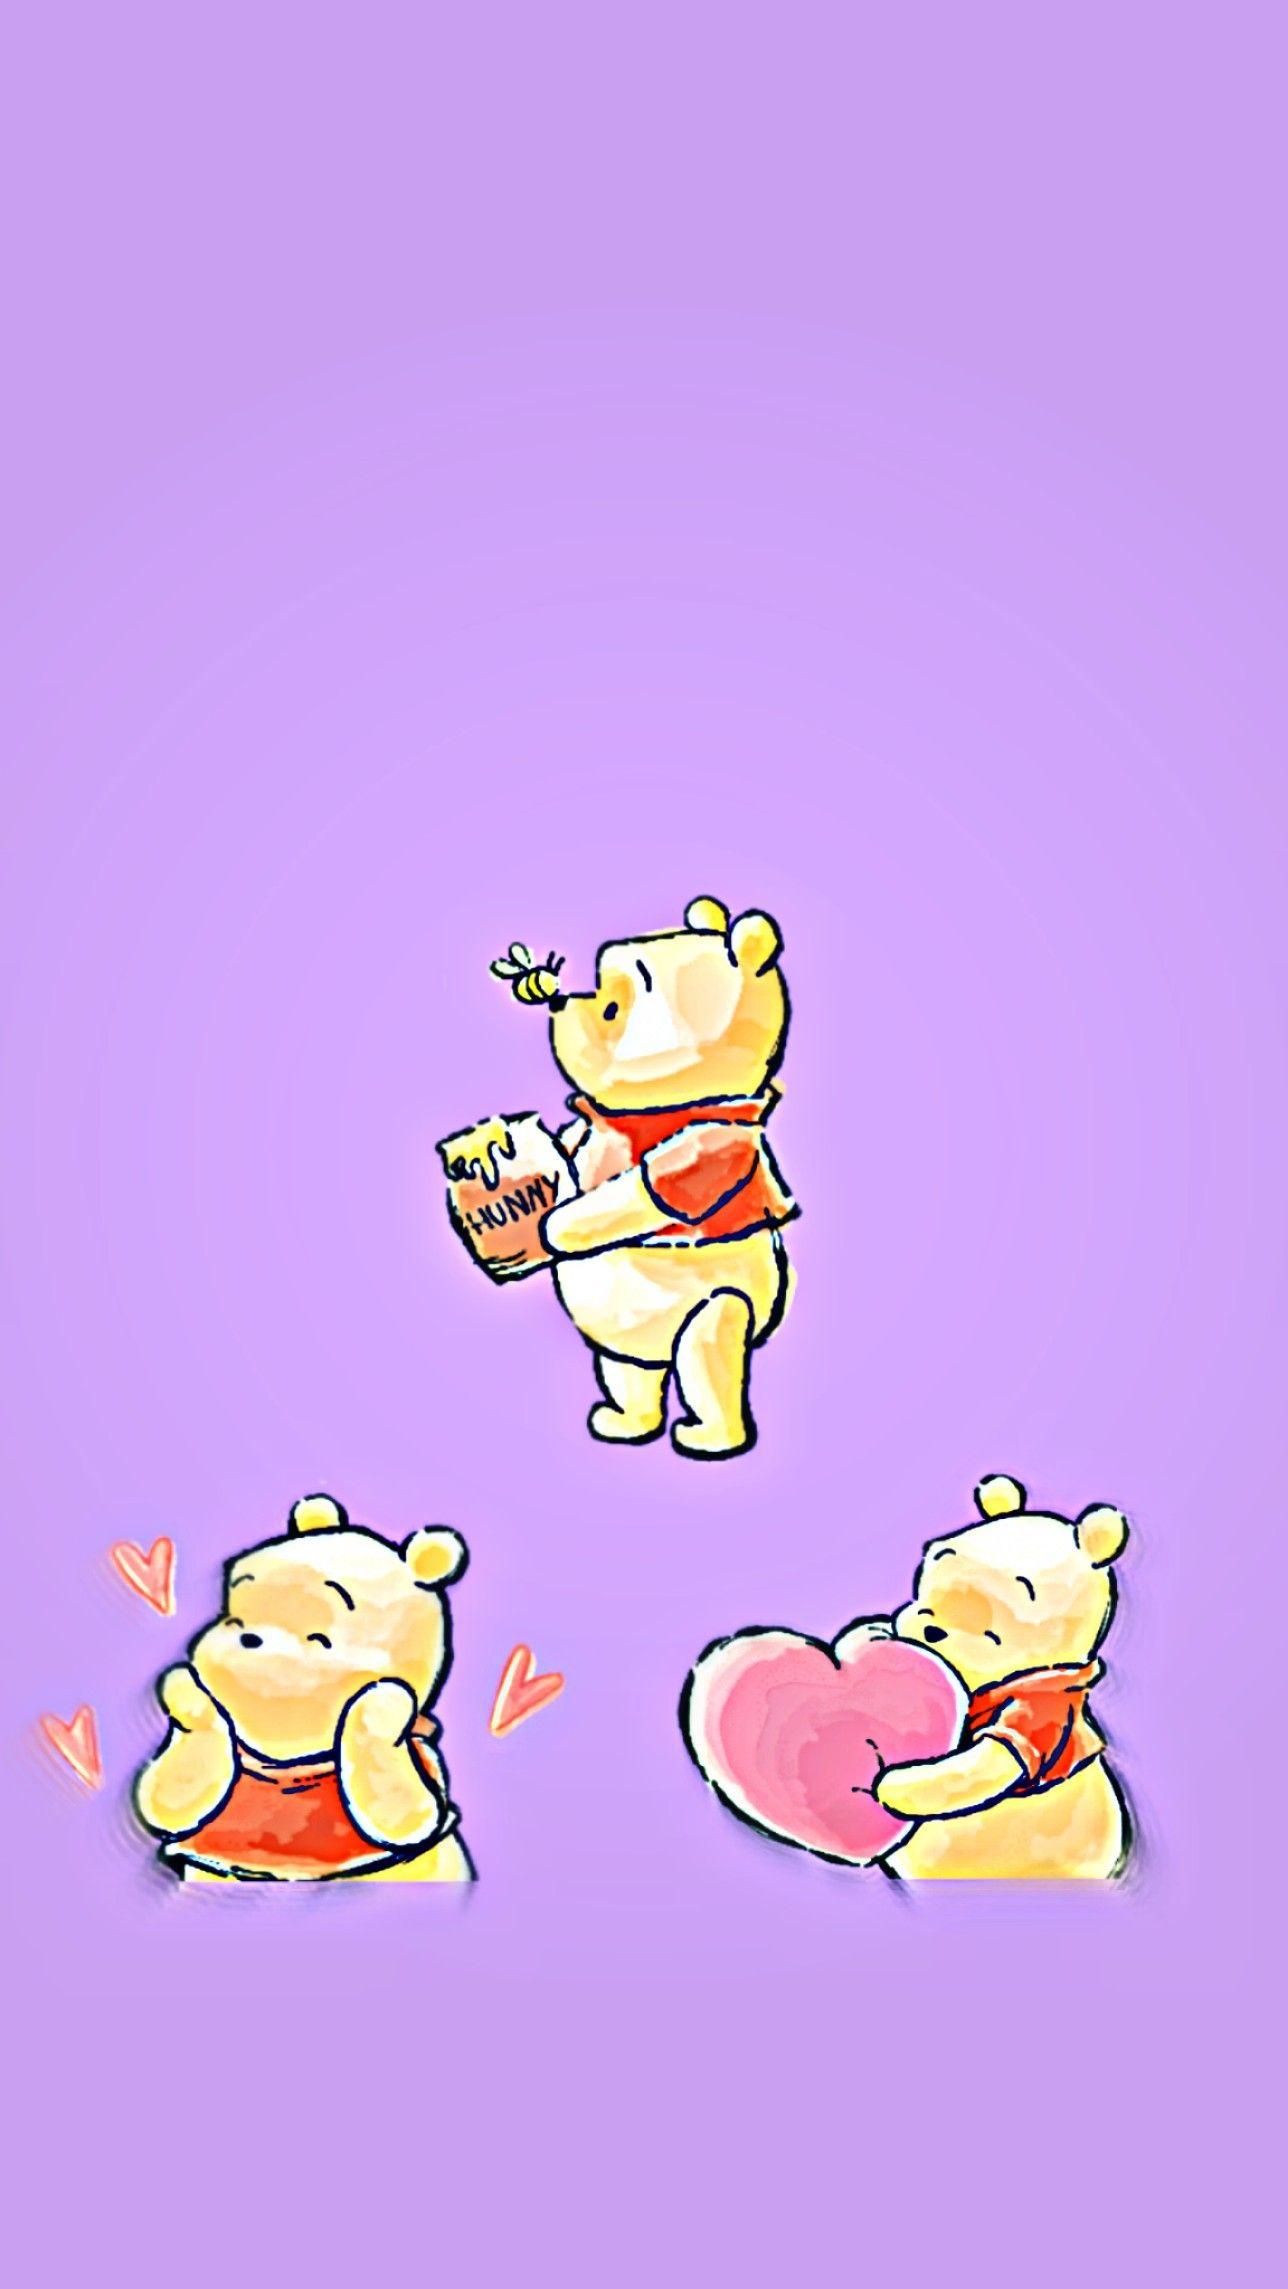 Winnie The Pooh Wallpaper Cute Winnie The Pooh Cute Cartoon Wallpapers Pooh